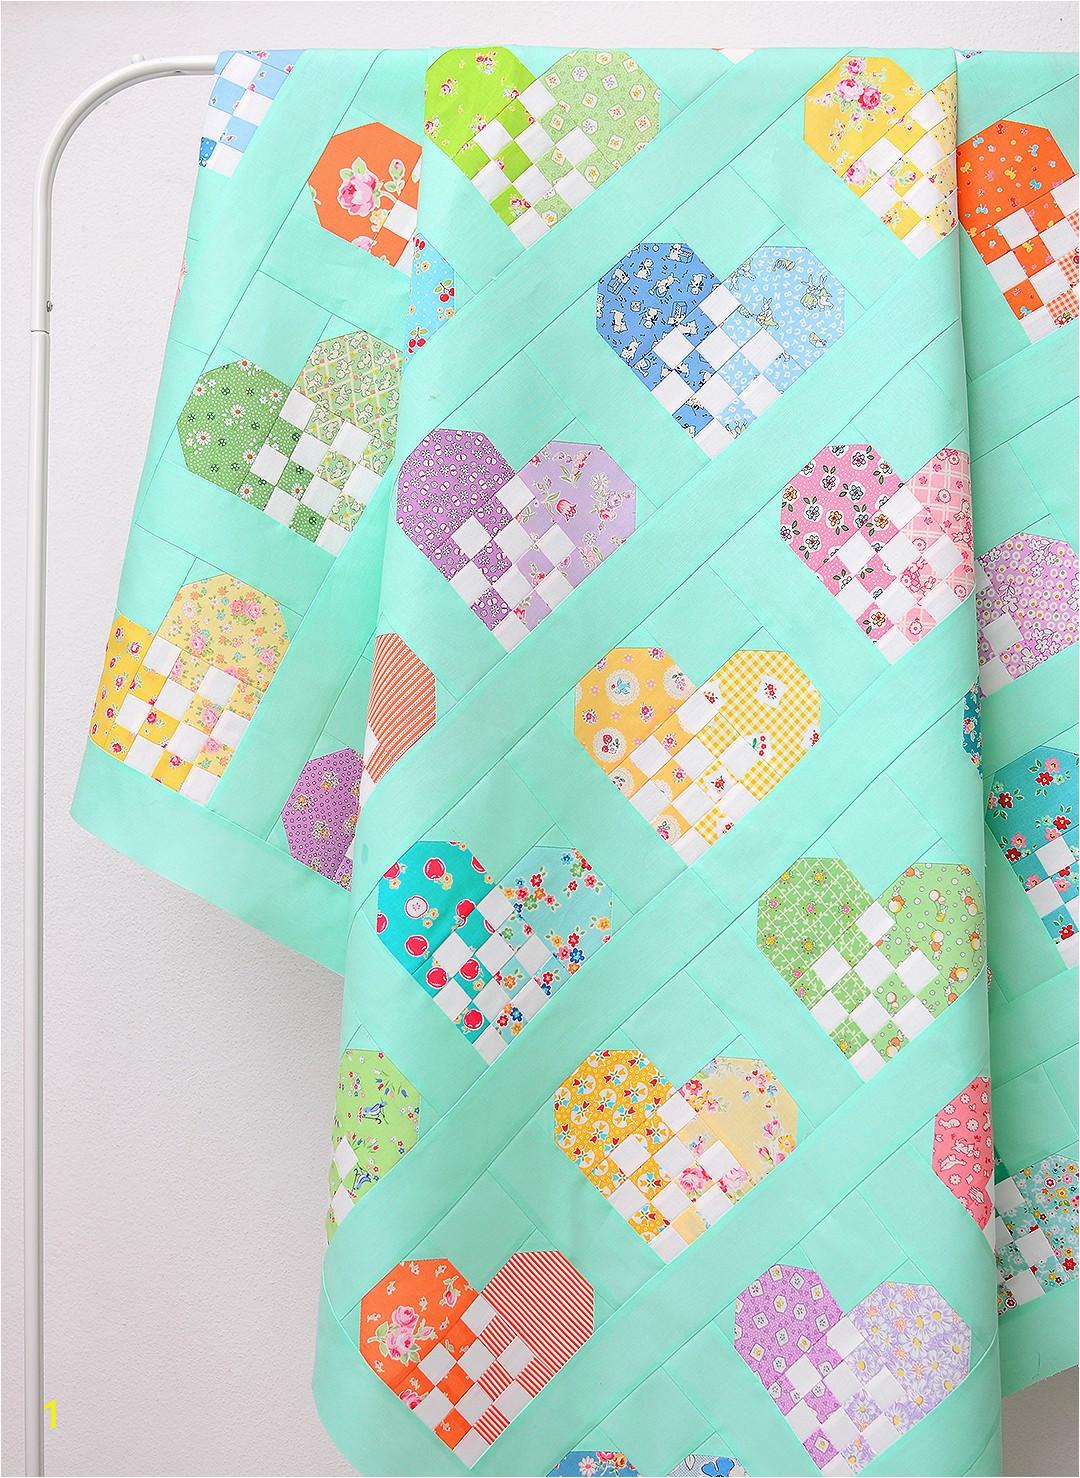 checkered heart quilt free quilt pattern free tutorial nadra ridgeway ellis and higgs 11